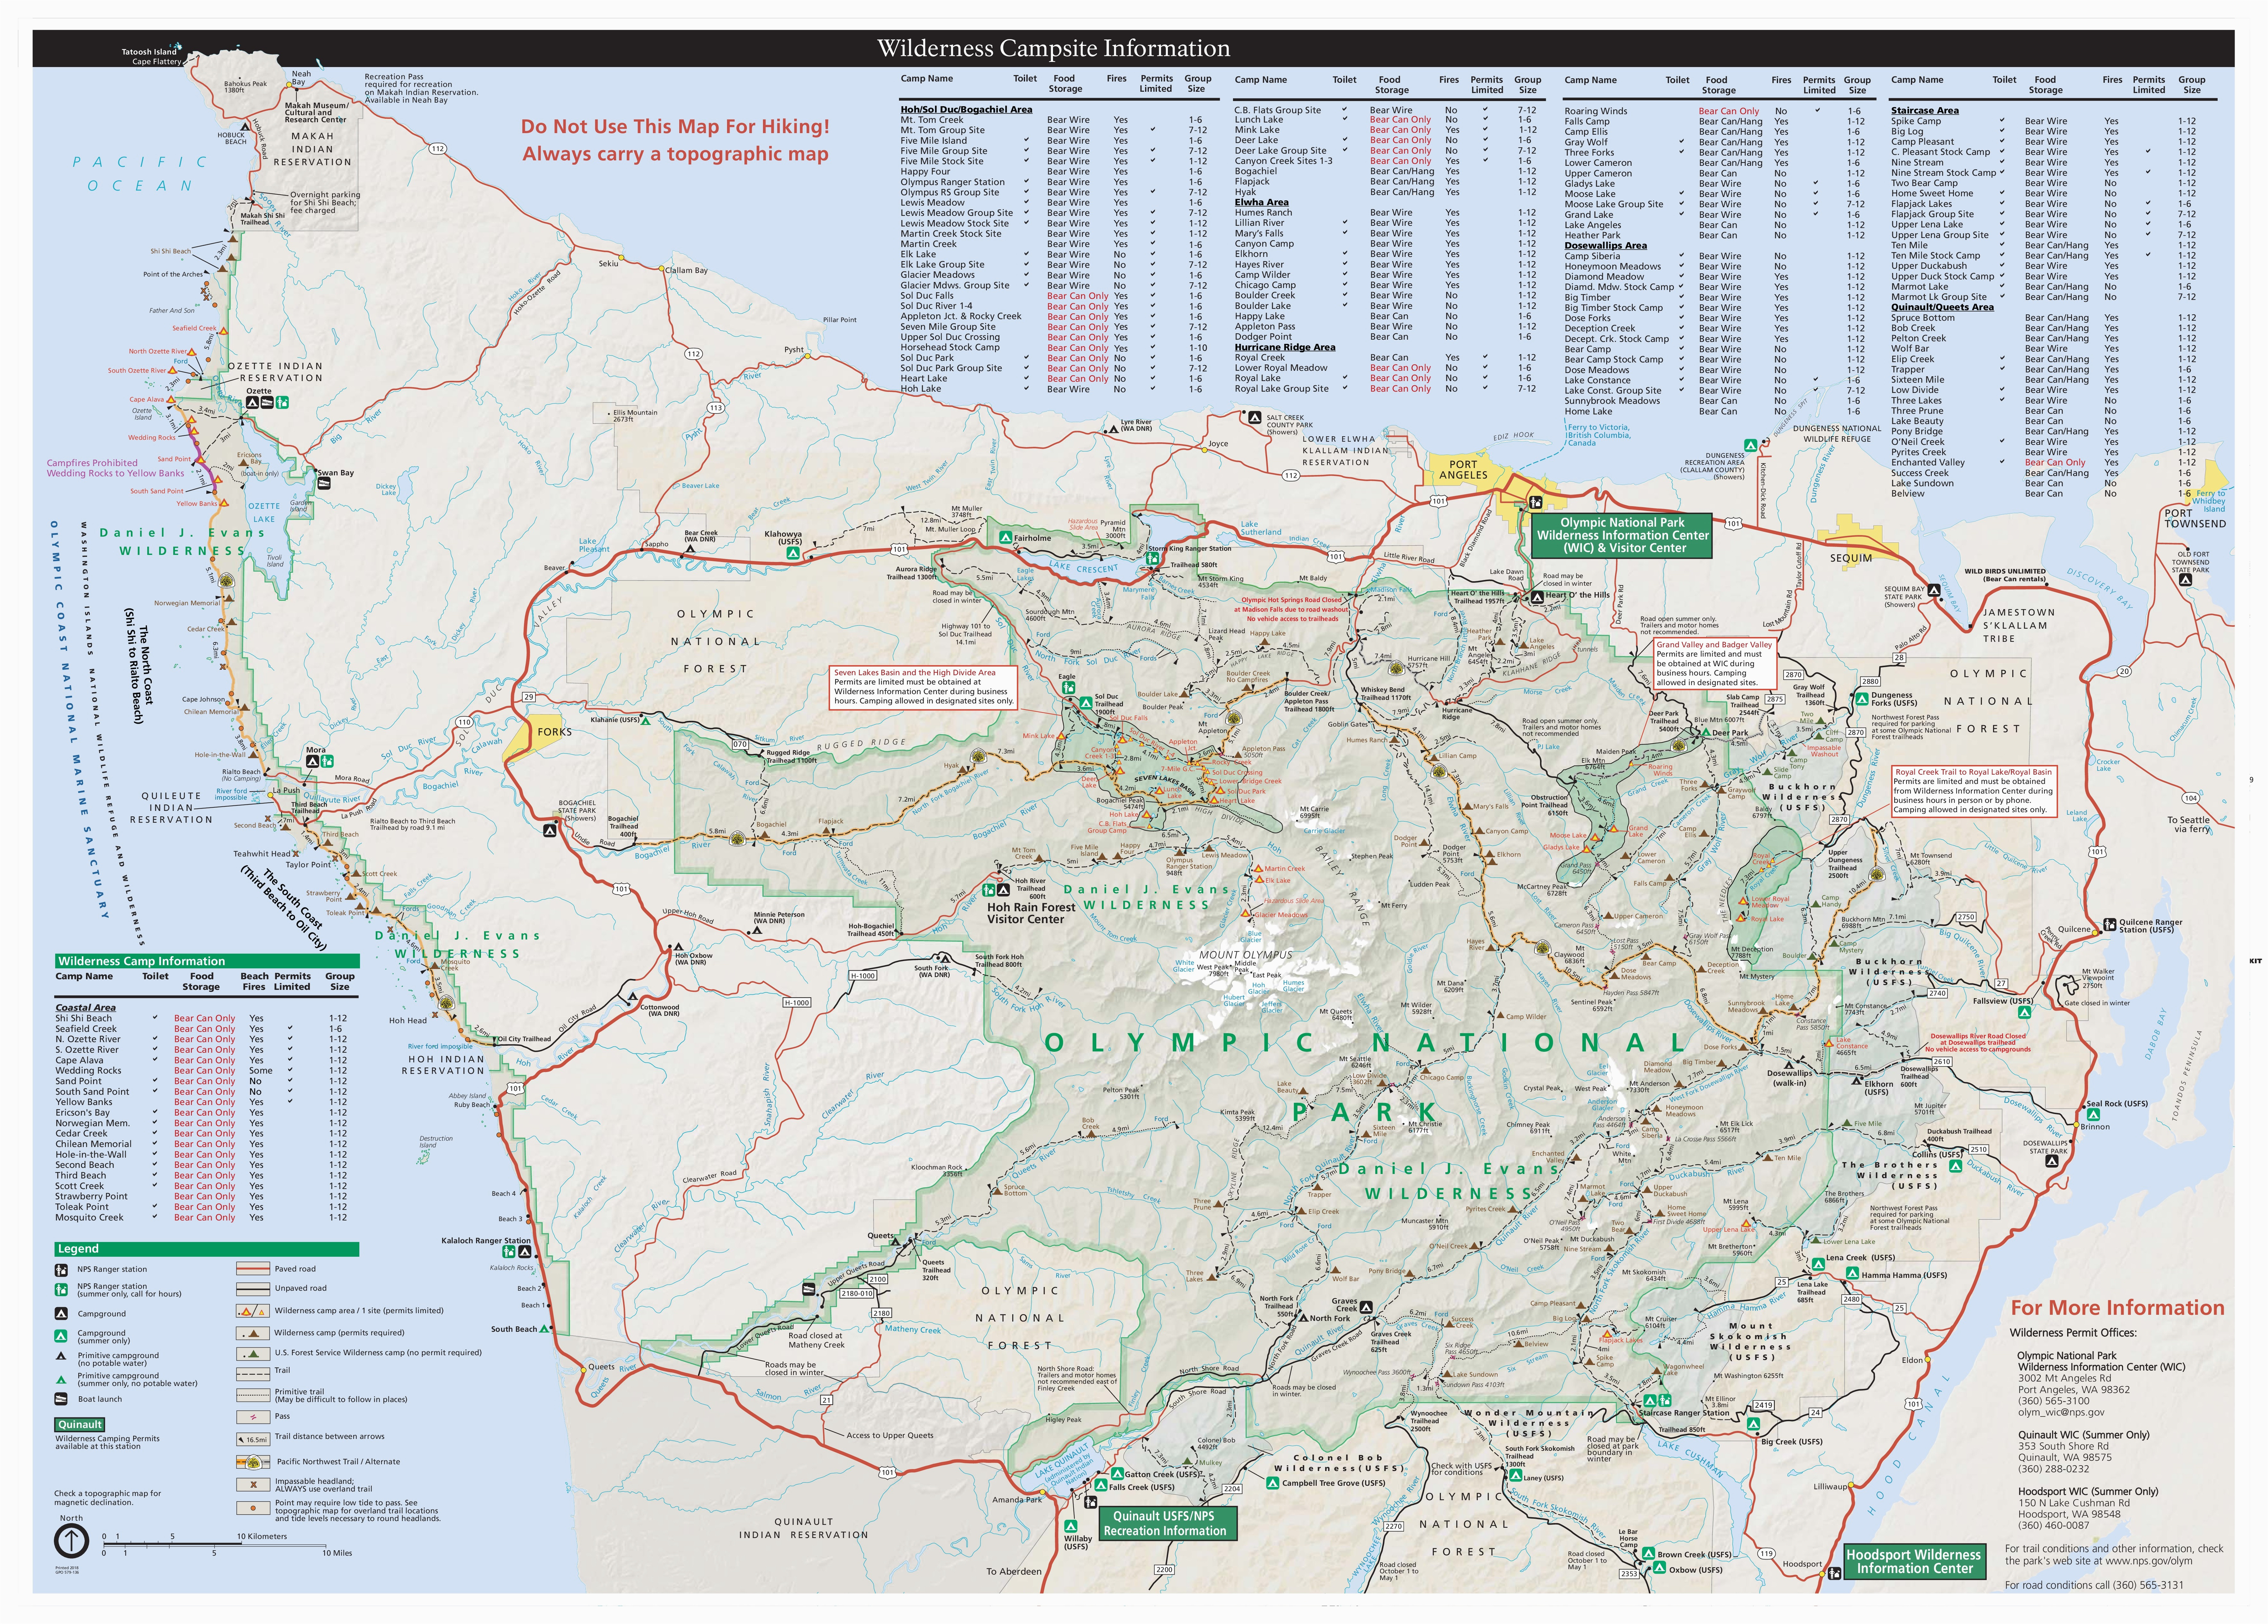 Oregon Ridge Park Map Maps Olympic National Park U S National Park on road maps oregon, nasa maps oregon, city maps oregon, blm maps oregon, deq maps oregon, odot maps oregon, state maps oregon, county maps oregon, watershed maps oregon, hiking maps oregon, usgs maps oregon,